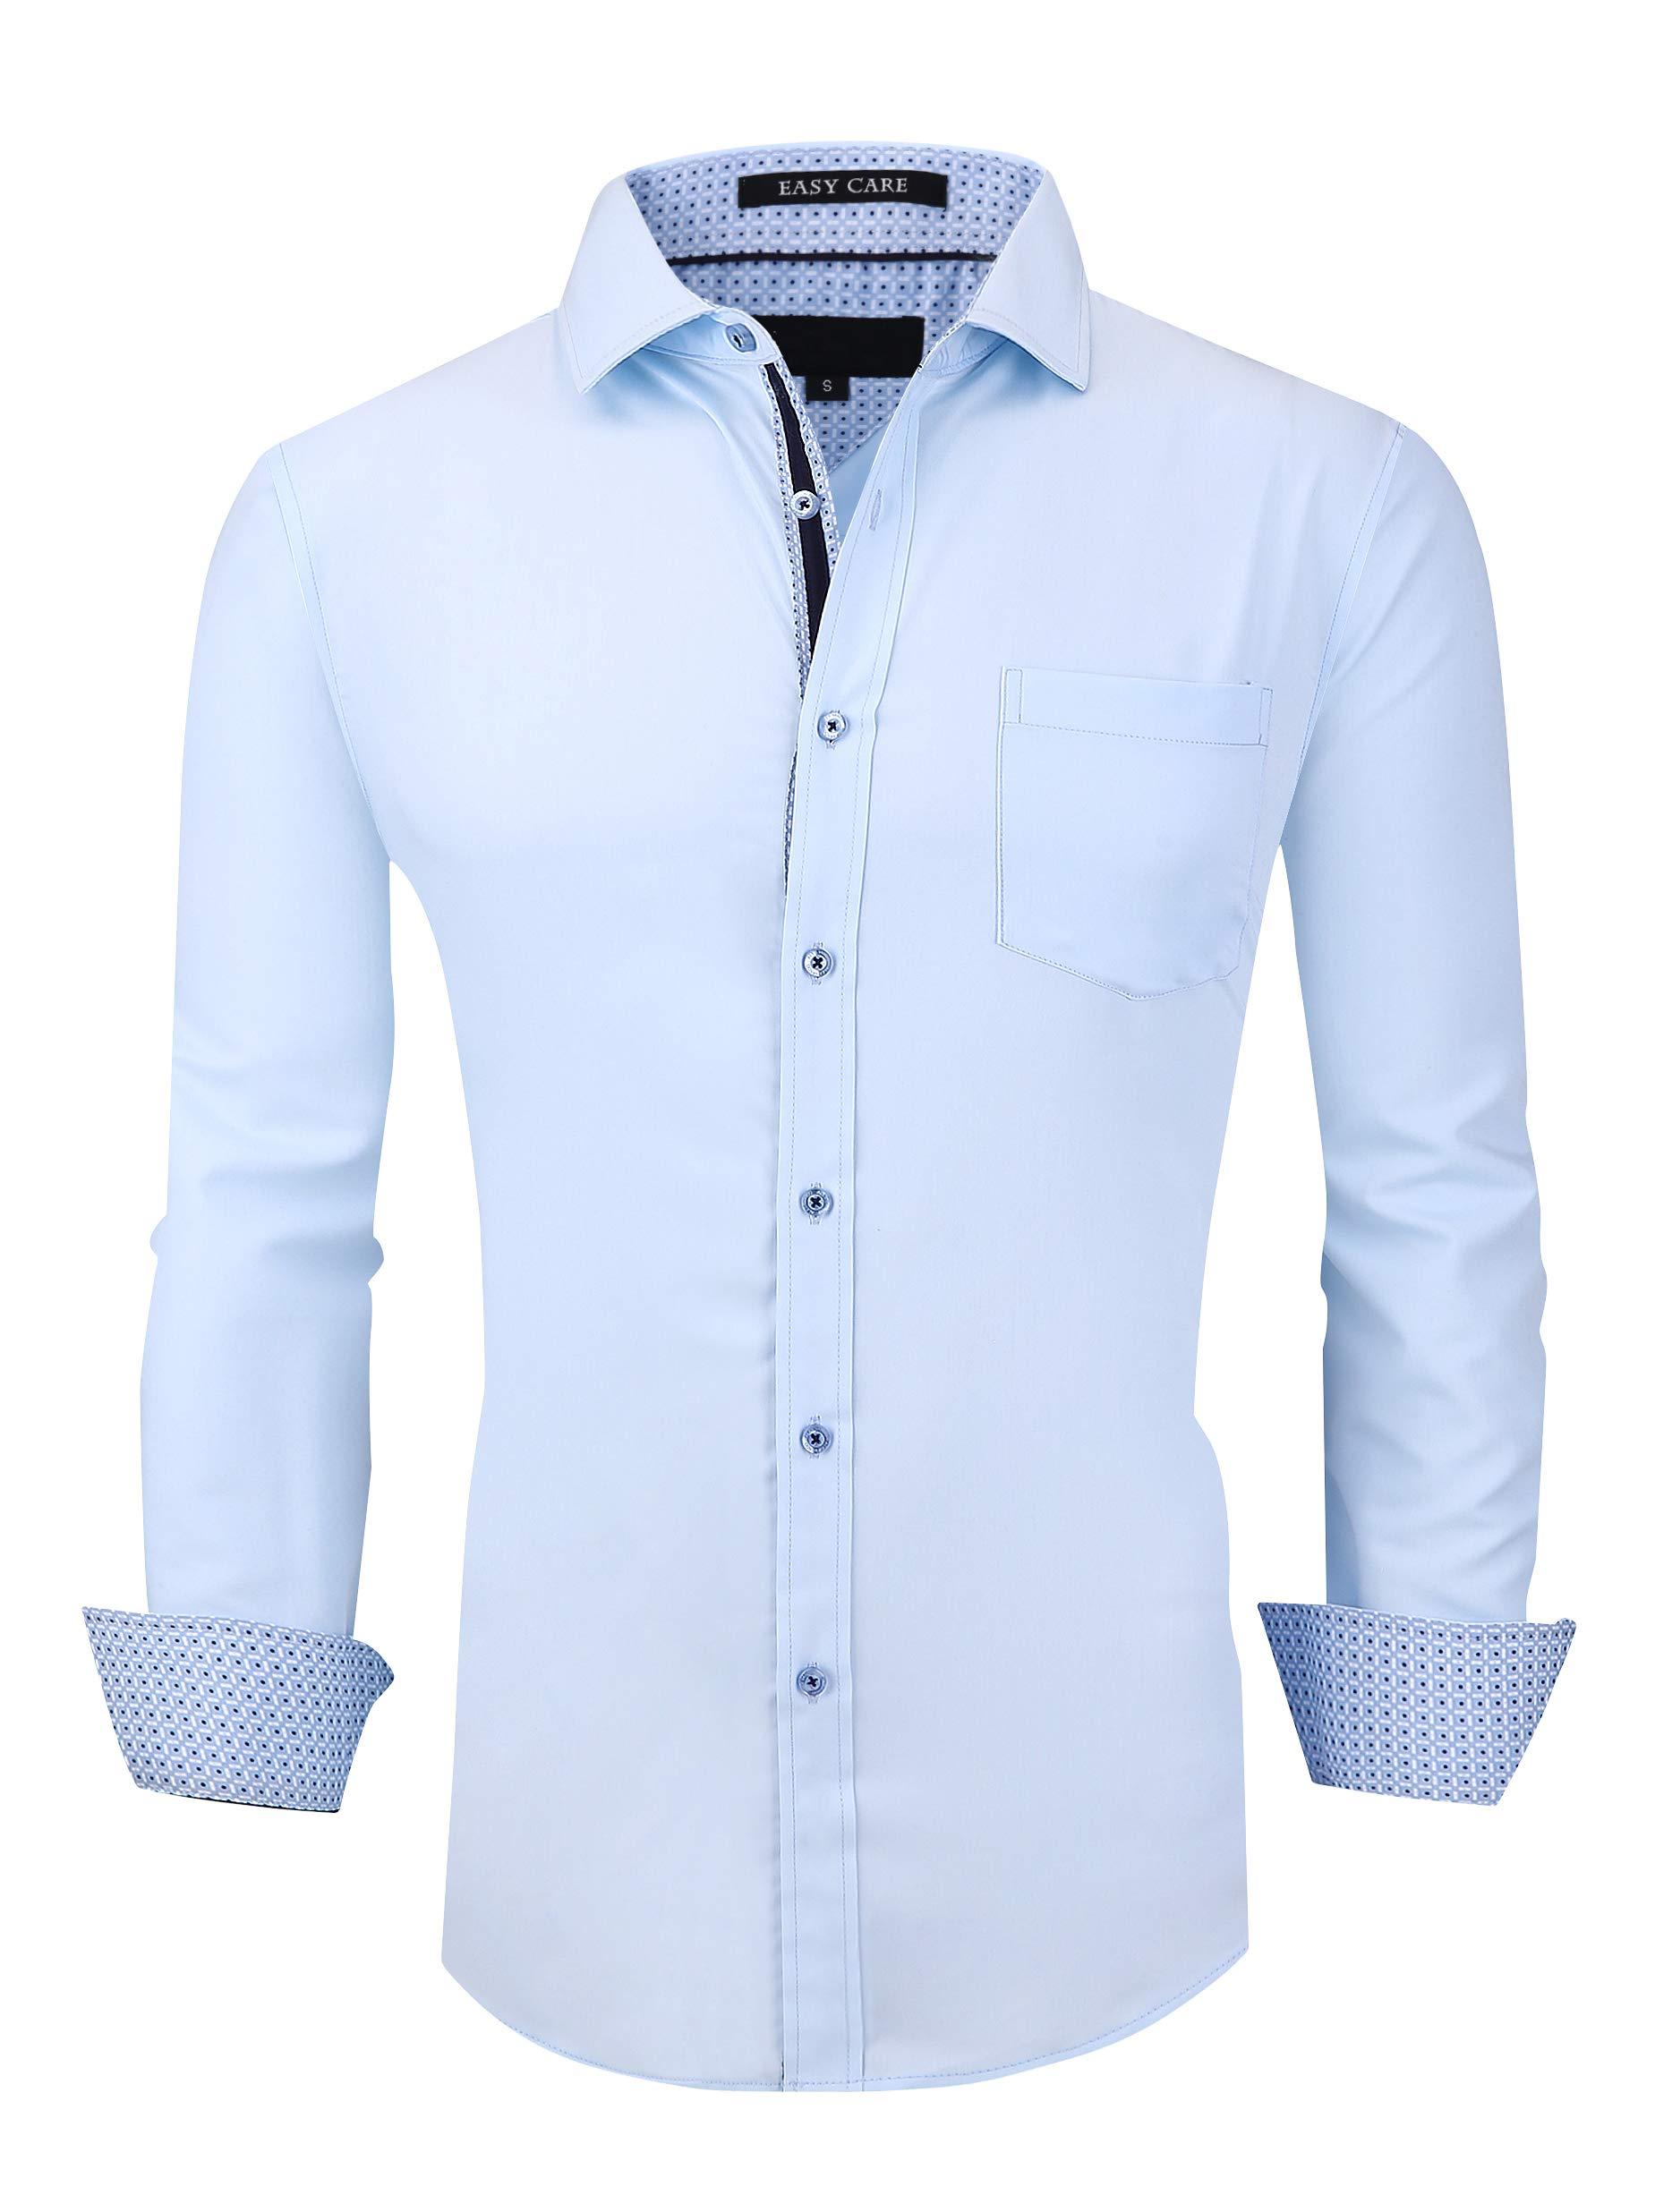 Esabel.C Mens Dress Shirts Wrinkle Free Regular Fit Long Sleeve Solid Bamboo Fiber Button Down Shirts